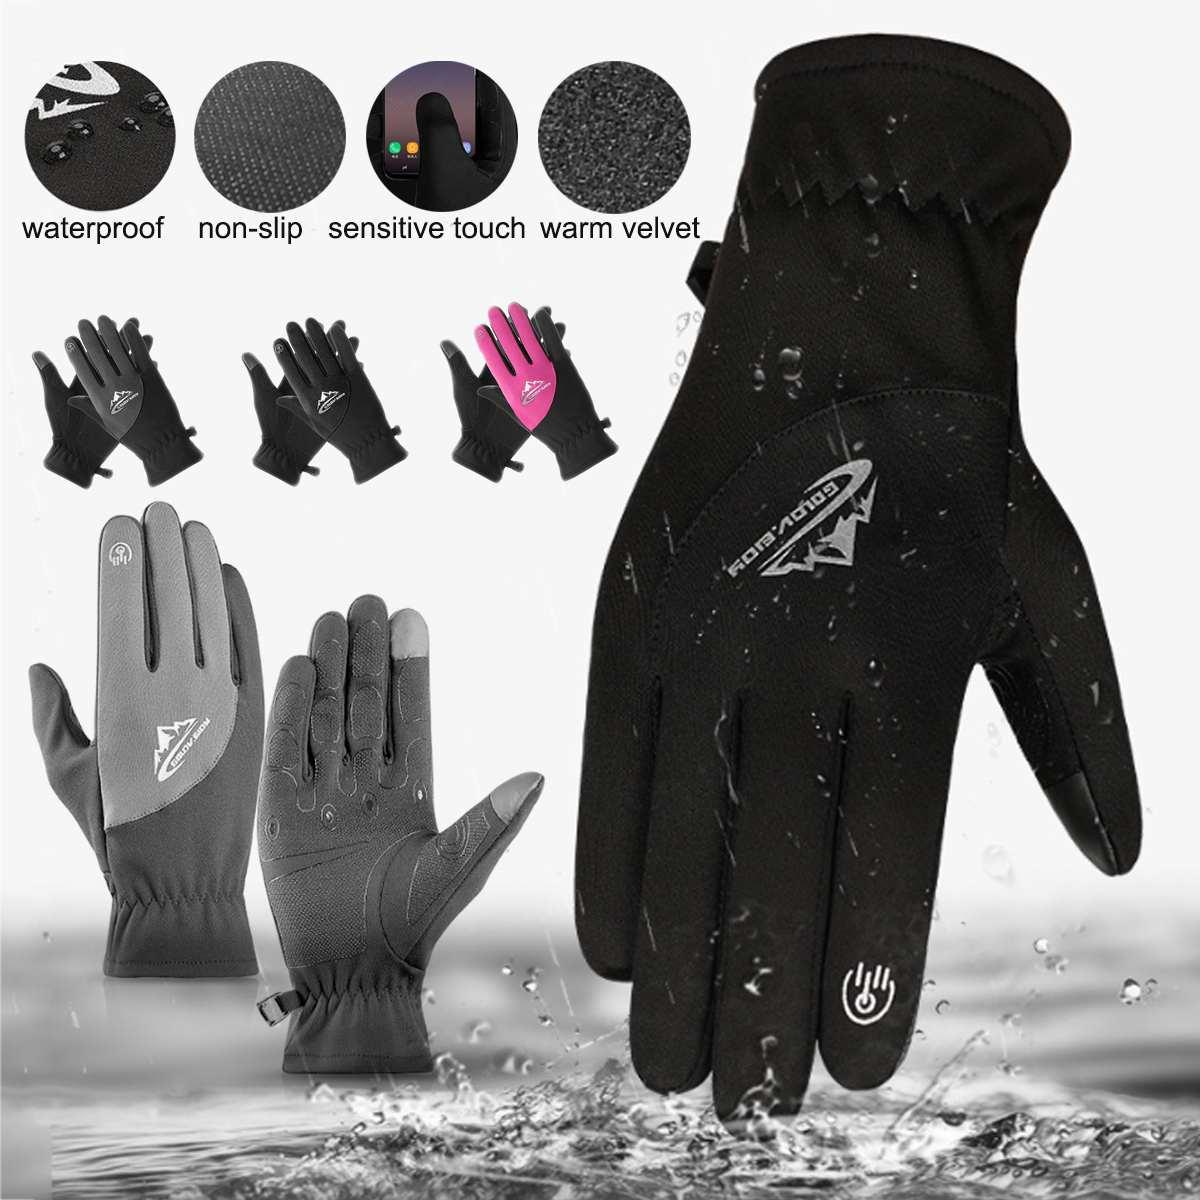 Thermal Ski Gloves Winter Fleece Waterproof Snowboard Gloves Snow Motorcycle Skiing Gloves Sportswear For Men Women Gloves